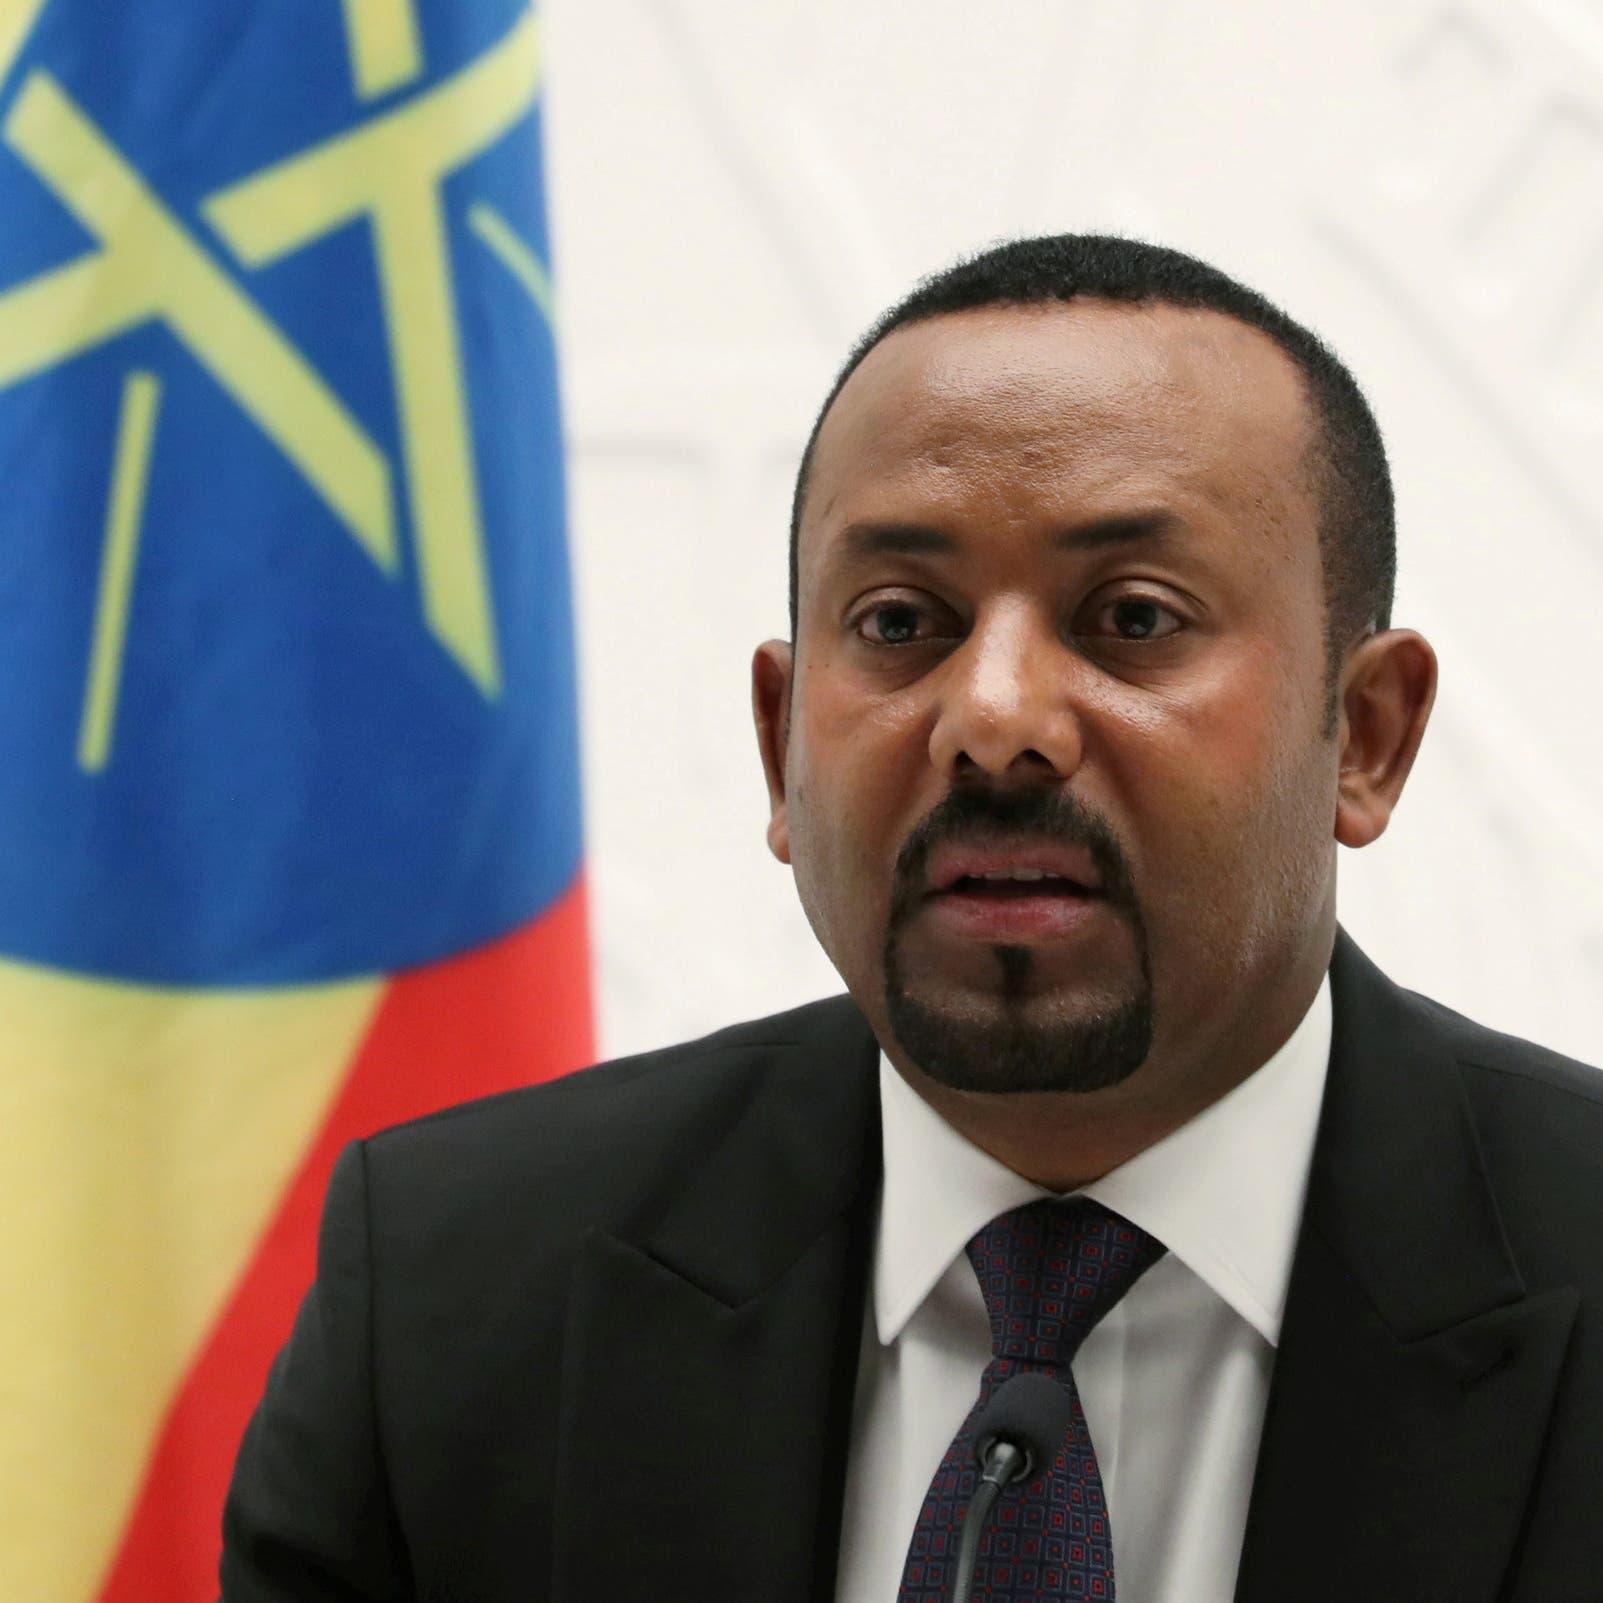 Ethiopia denounces US move to restrict visas over Tigray war